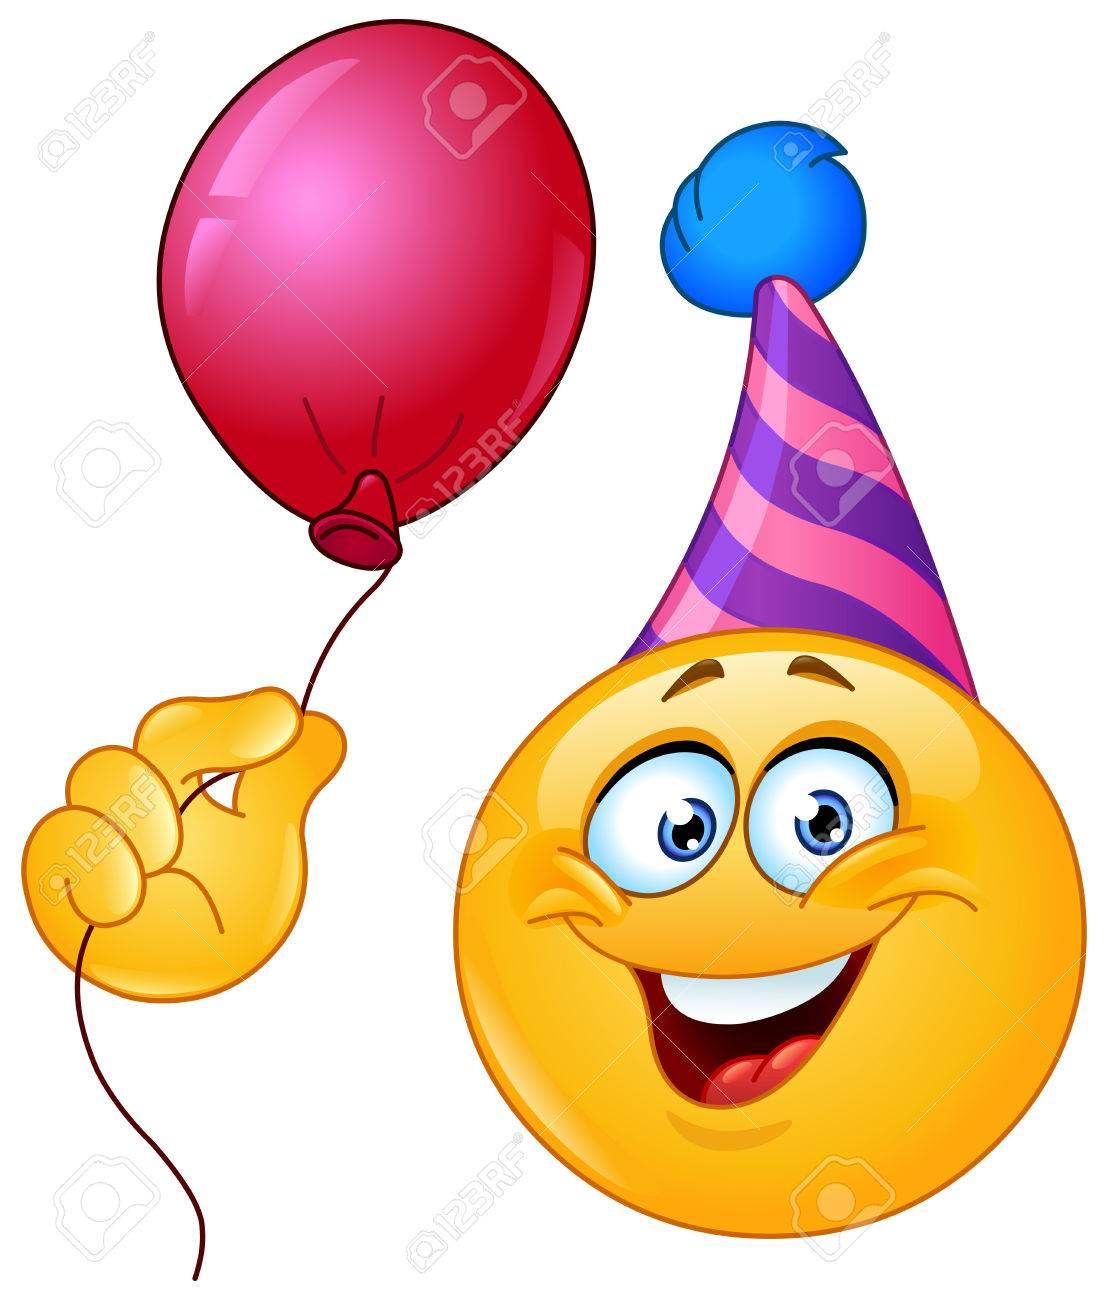 Geburtstag Emoji